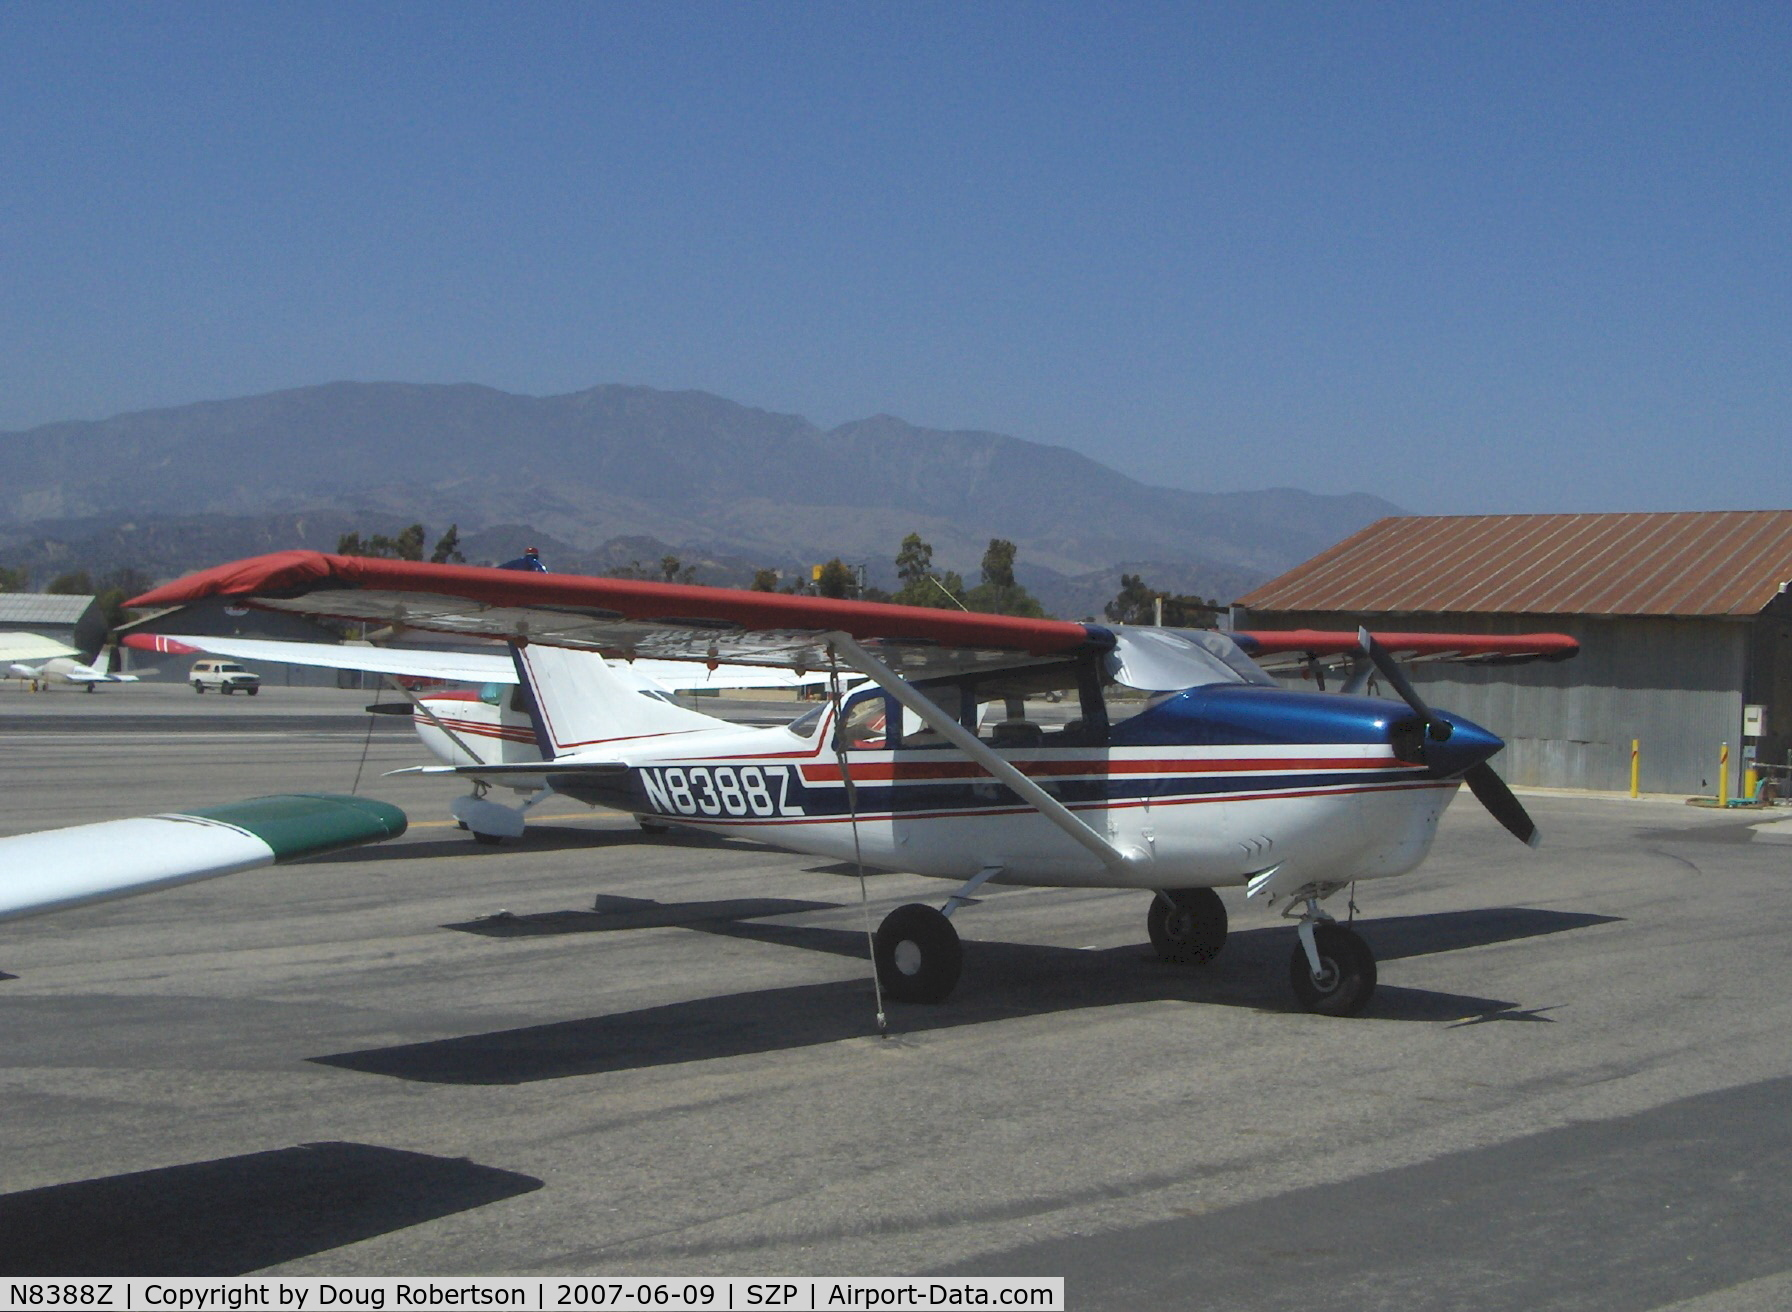 N8388Z, 1963 Cessna 210-5 C/N 205-0388, 1963 Cessna 210-5 (205) UTILINE (fixed gear version of C210) Continental IO-470-E 260 Hp